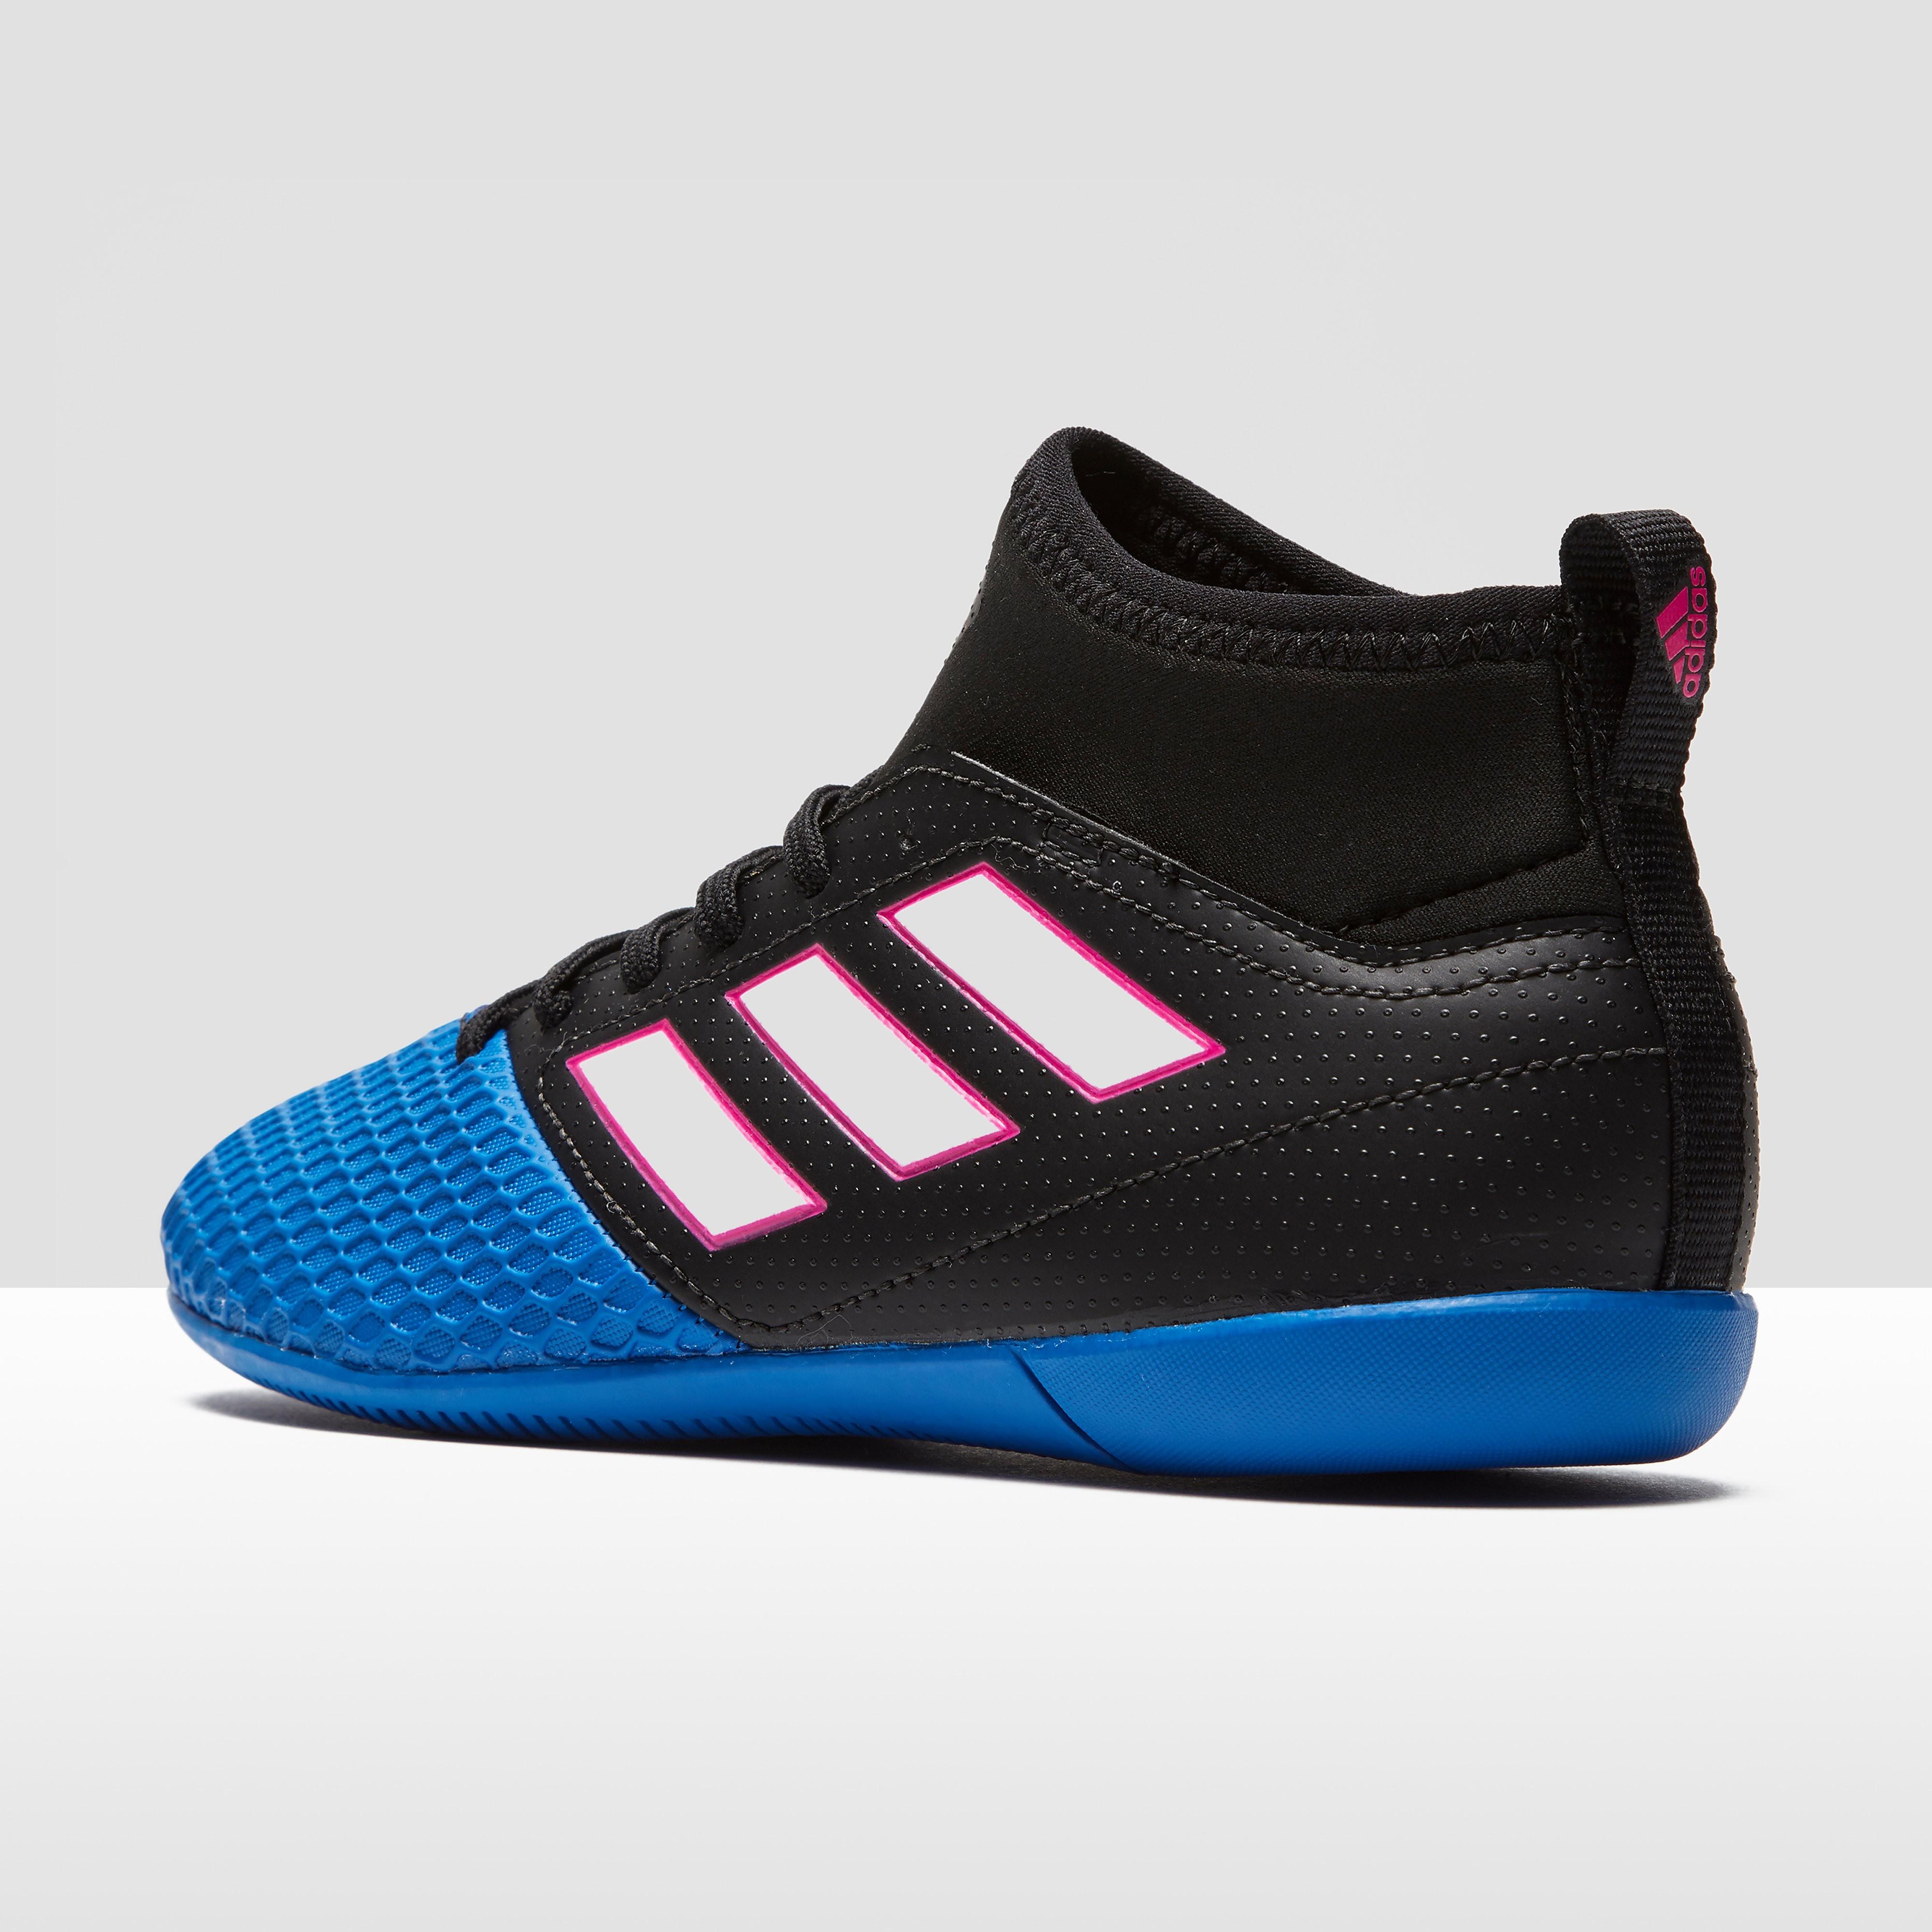 adidas Blue Blast Ace Primemesh 17.3 Indoor Court Children's Football Boots